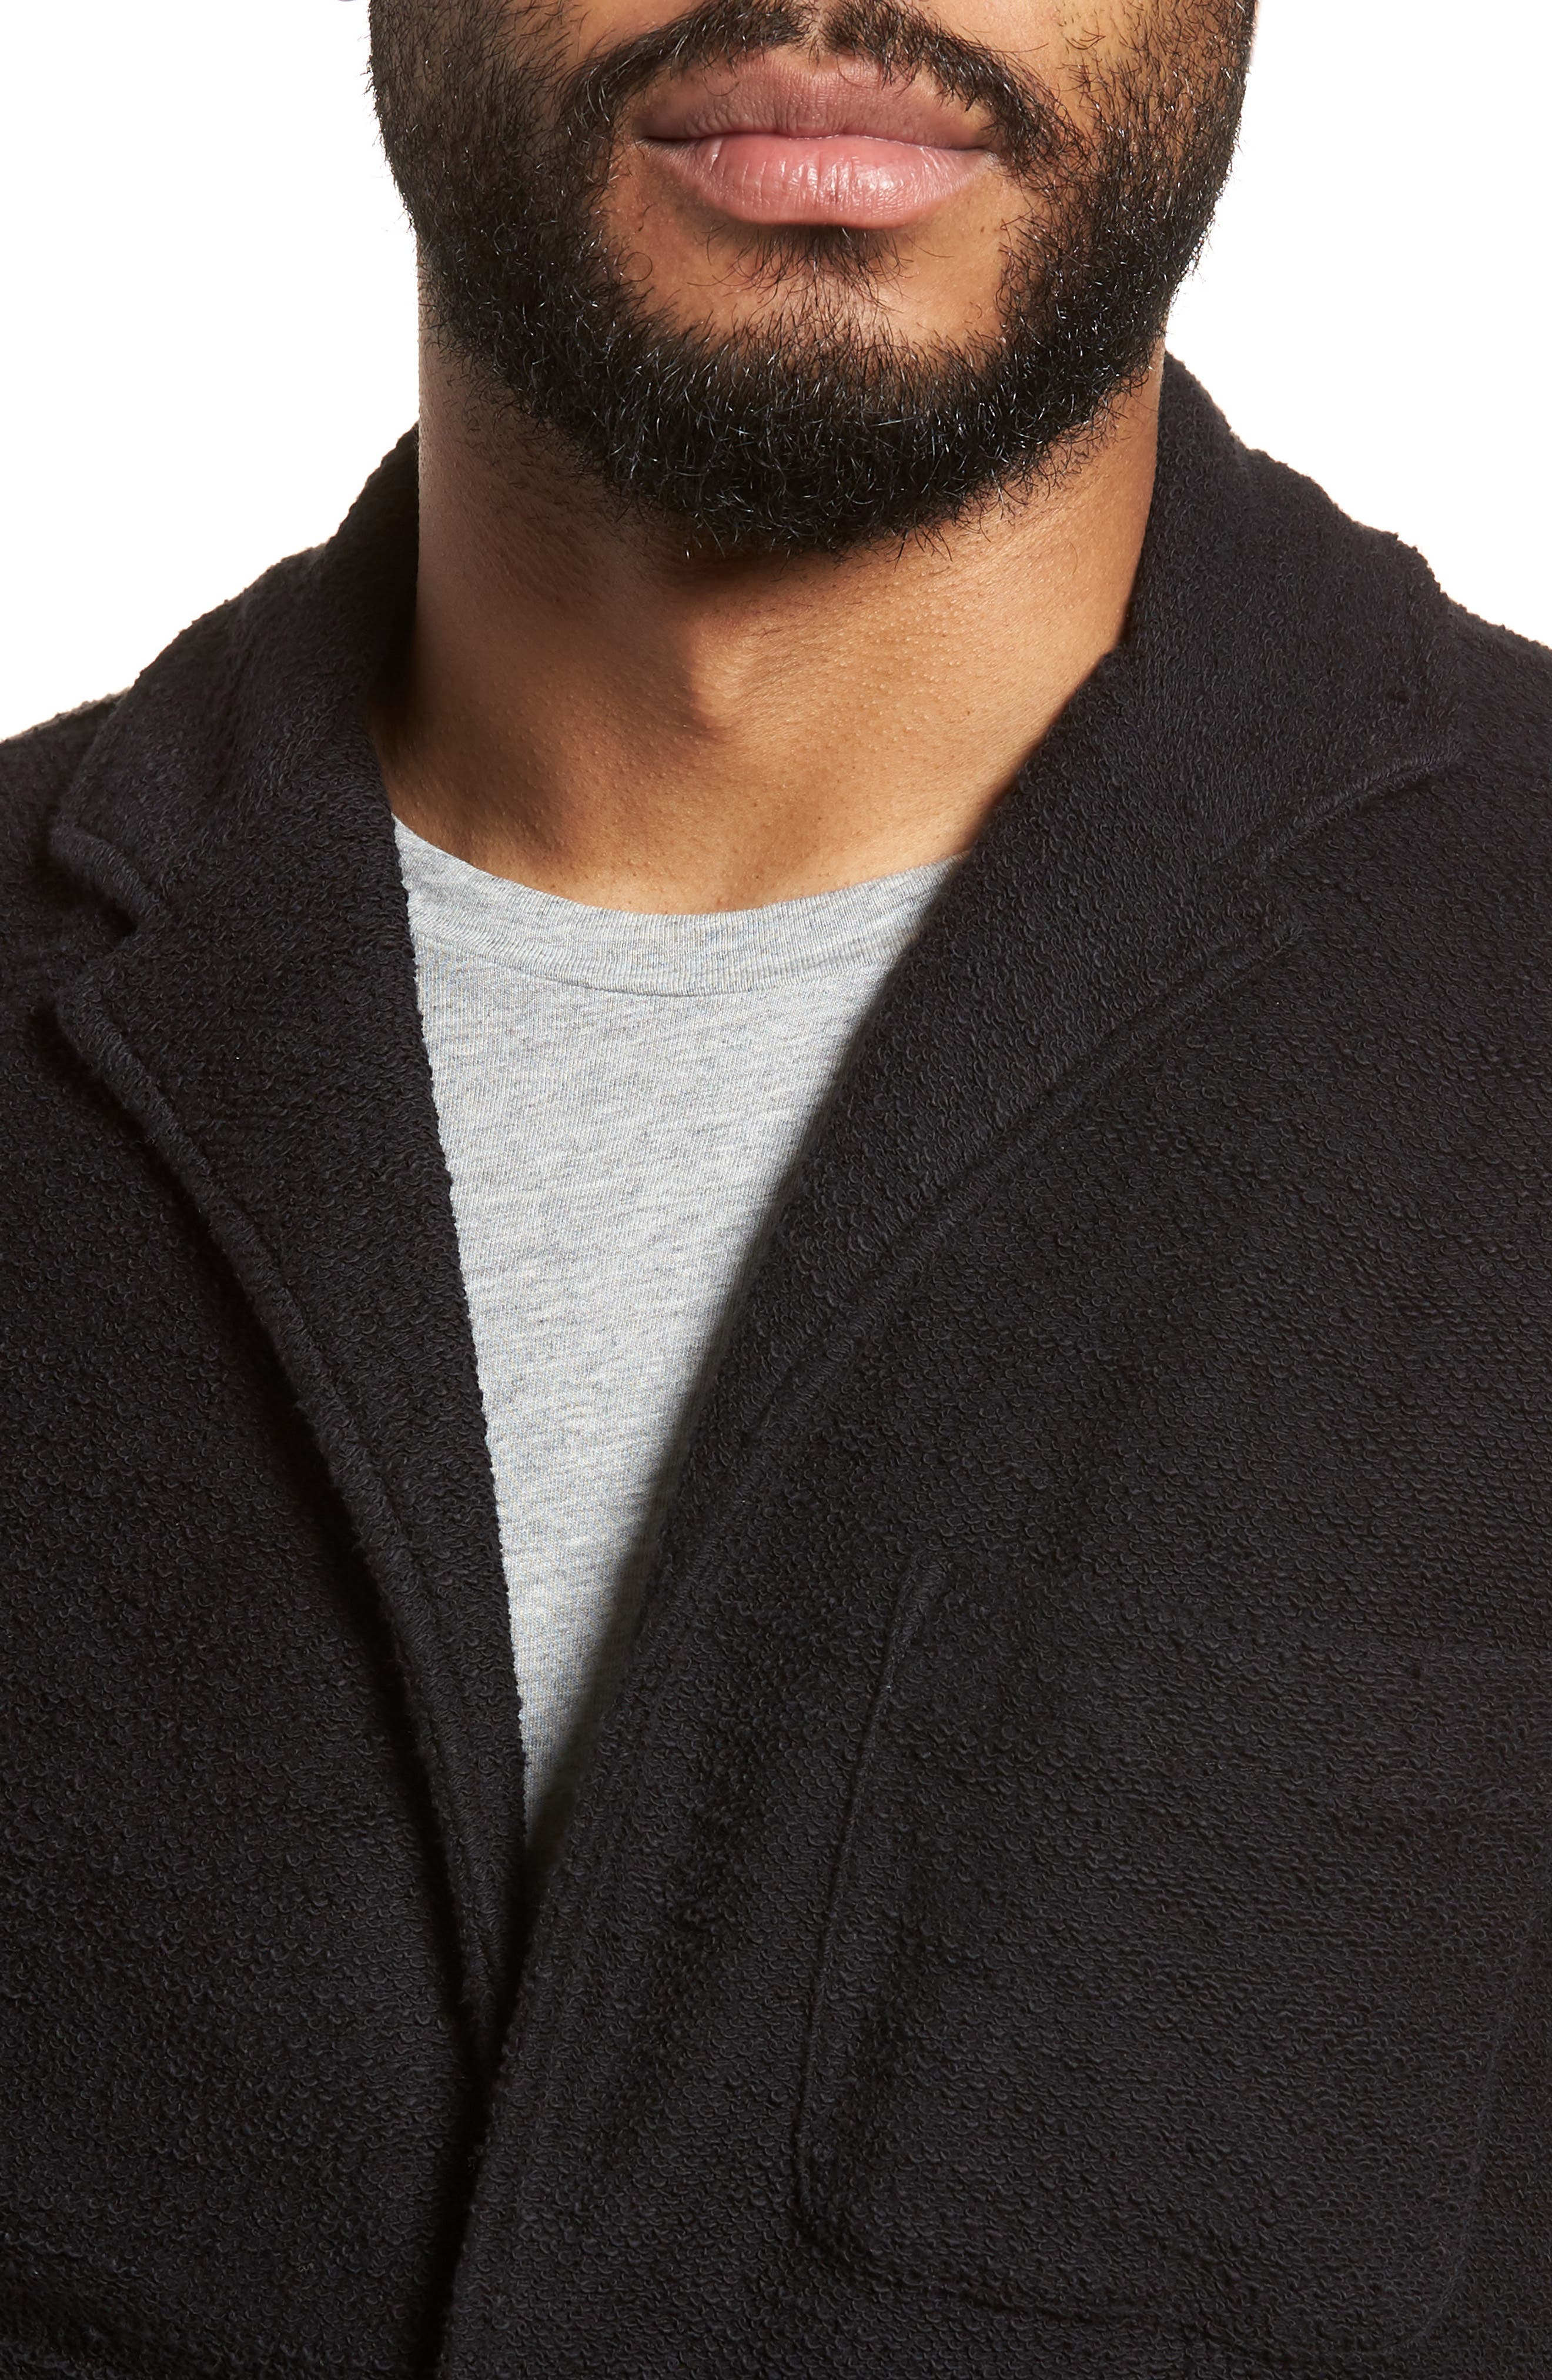 Terry Cloth Cotton Blend Blazer,                             Alternate thumbnail 4, color,                             001